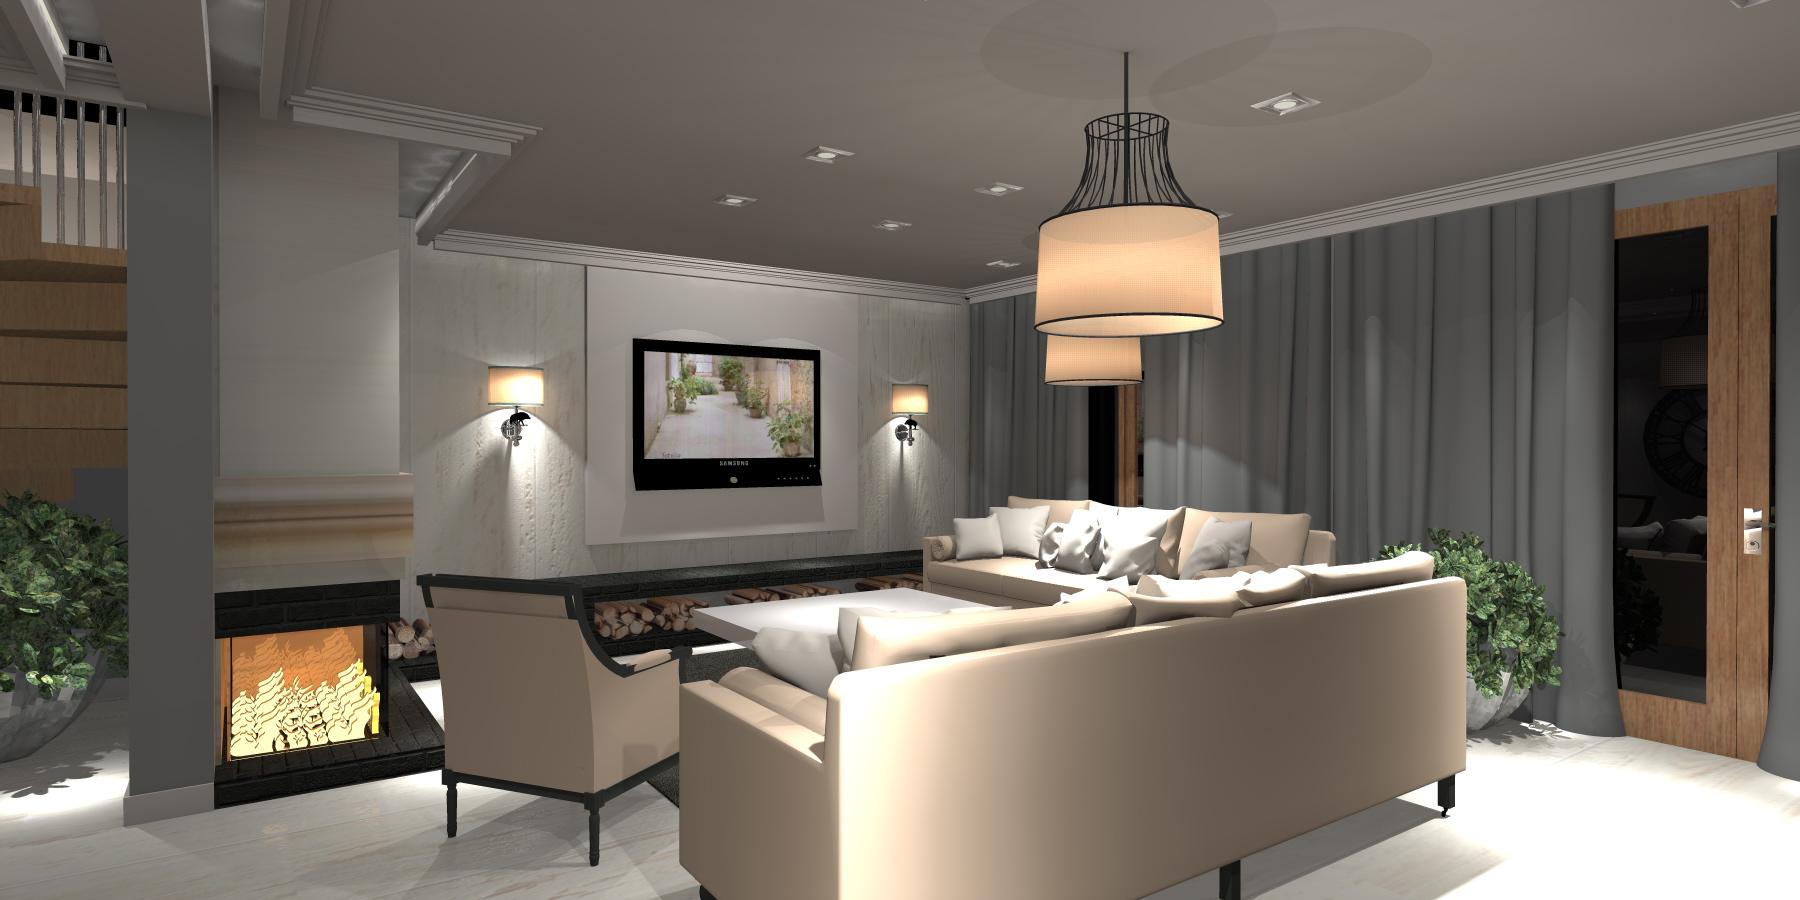 Projekt Salonu z jadalnią konc 3 klasyczna - Portfolio - Ancu Design